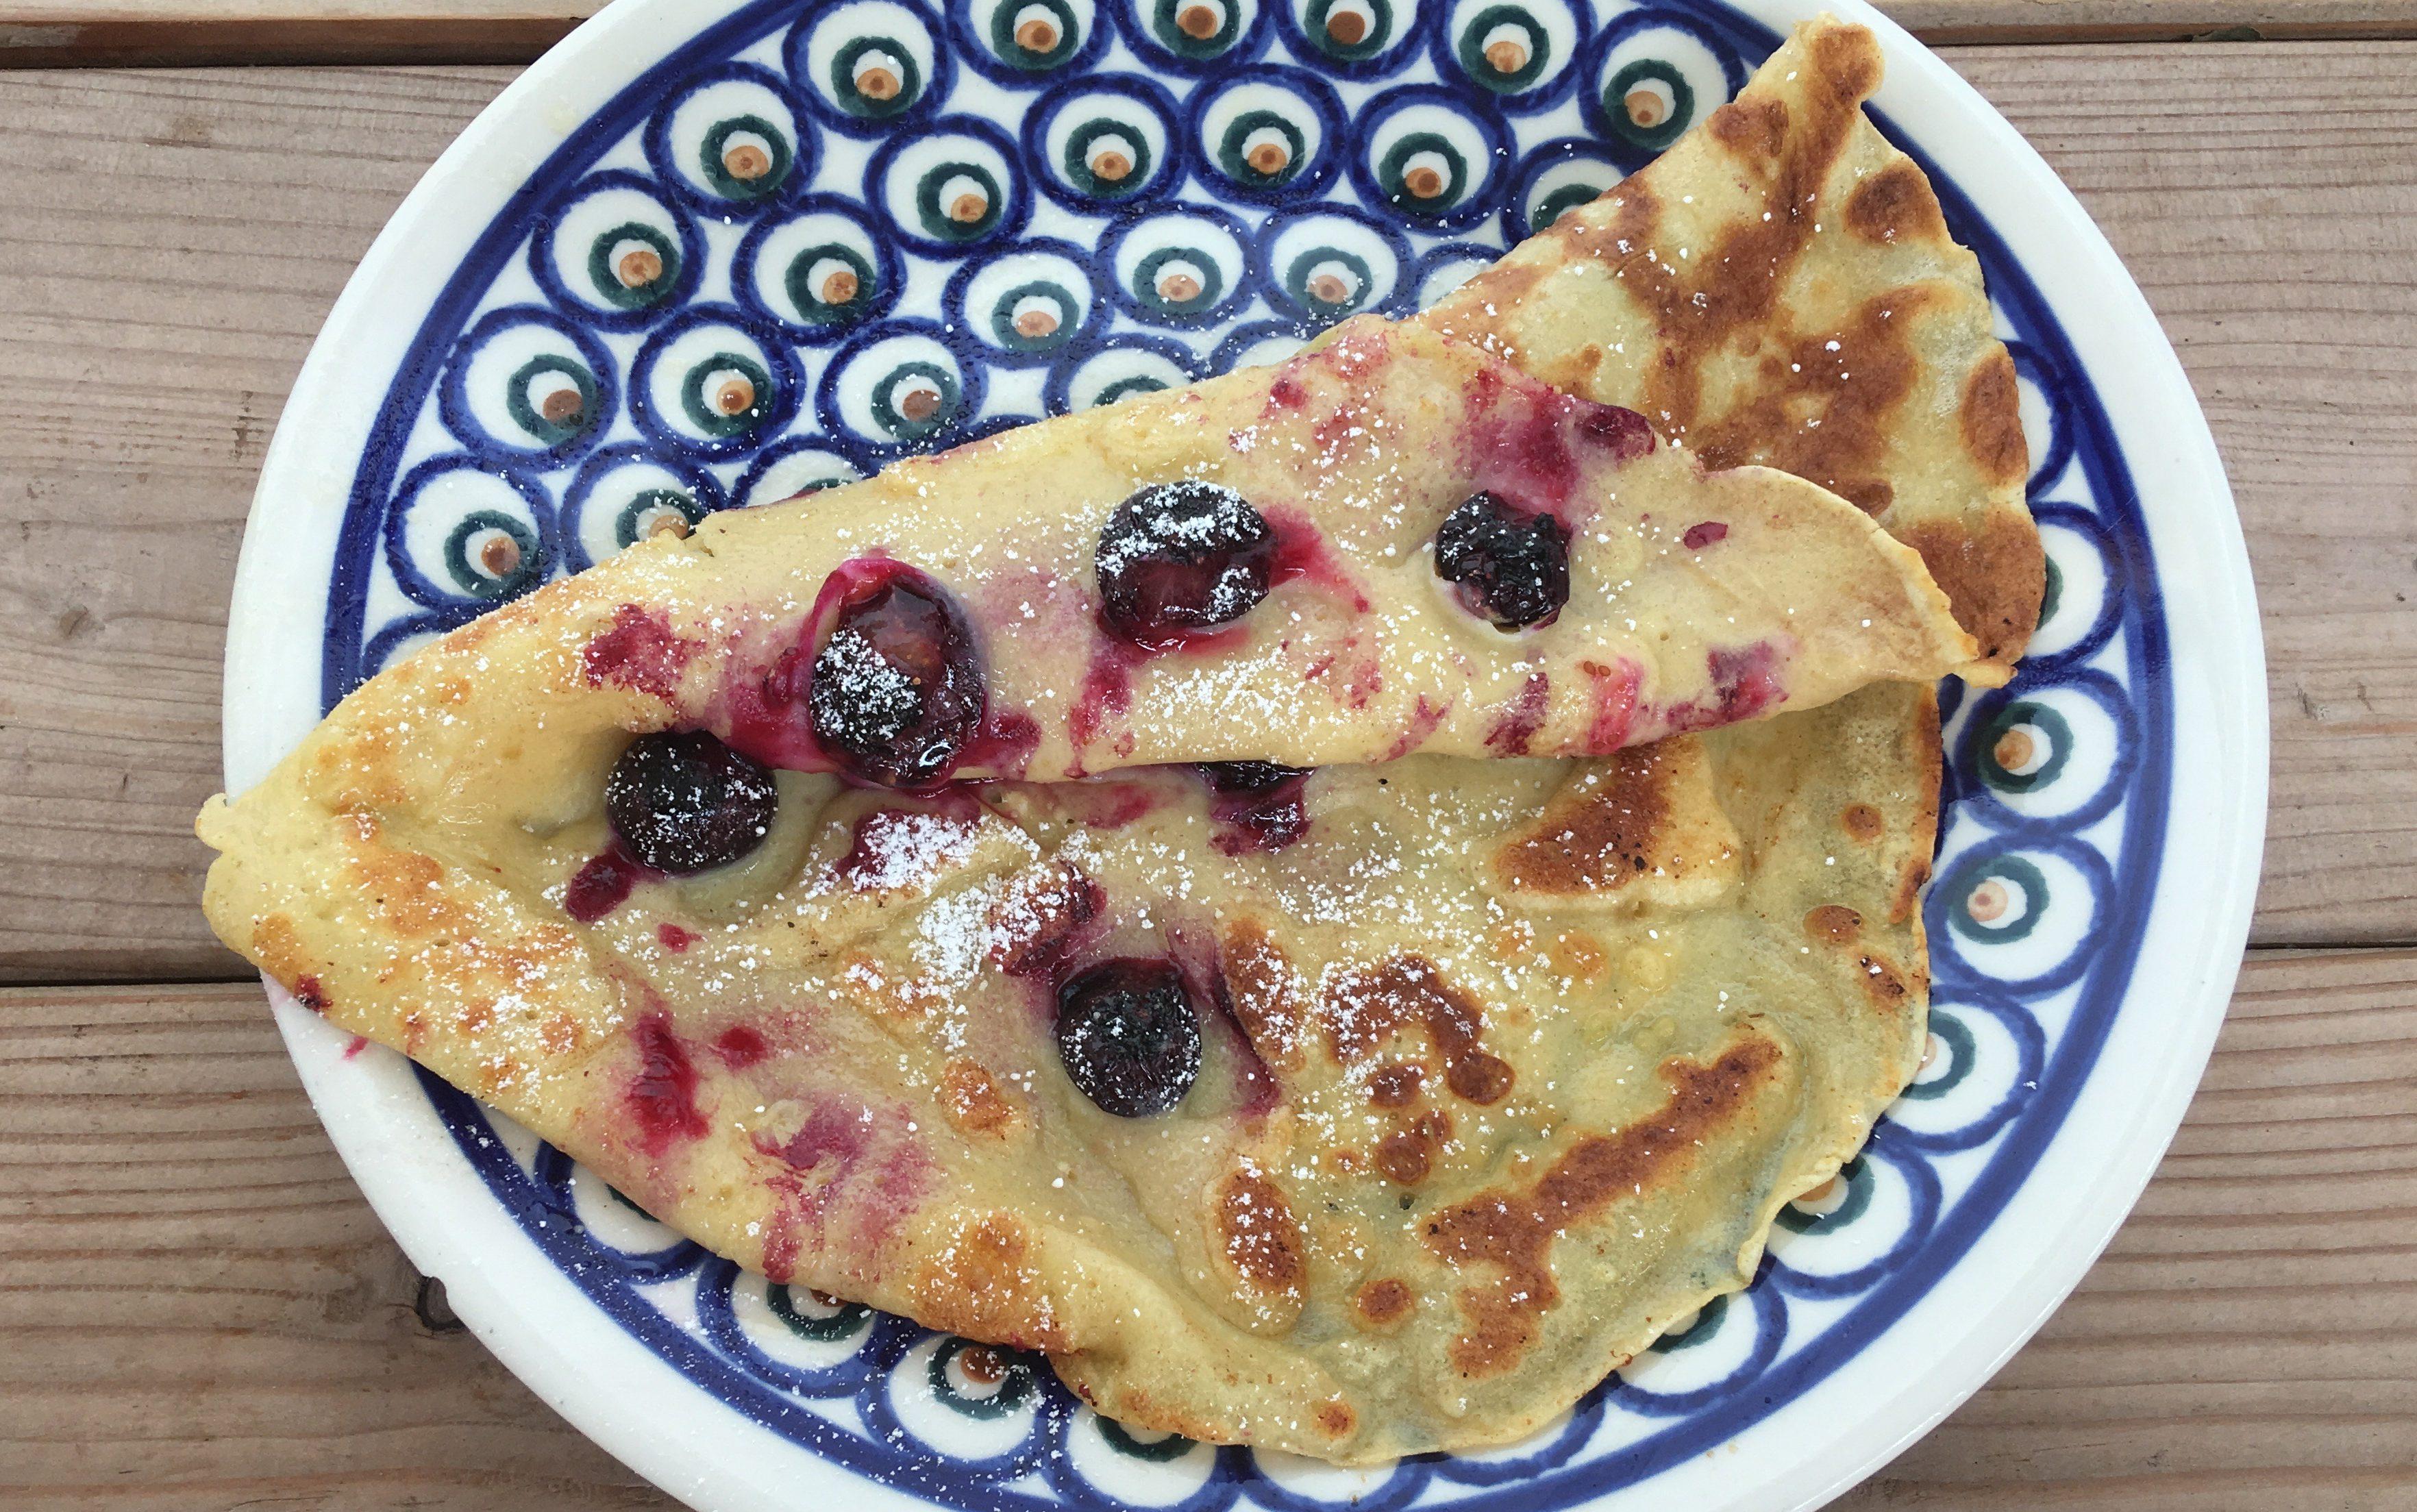 Das gesunde Frühstück